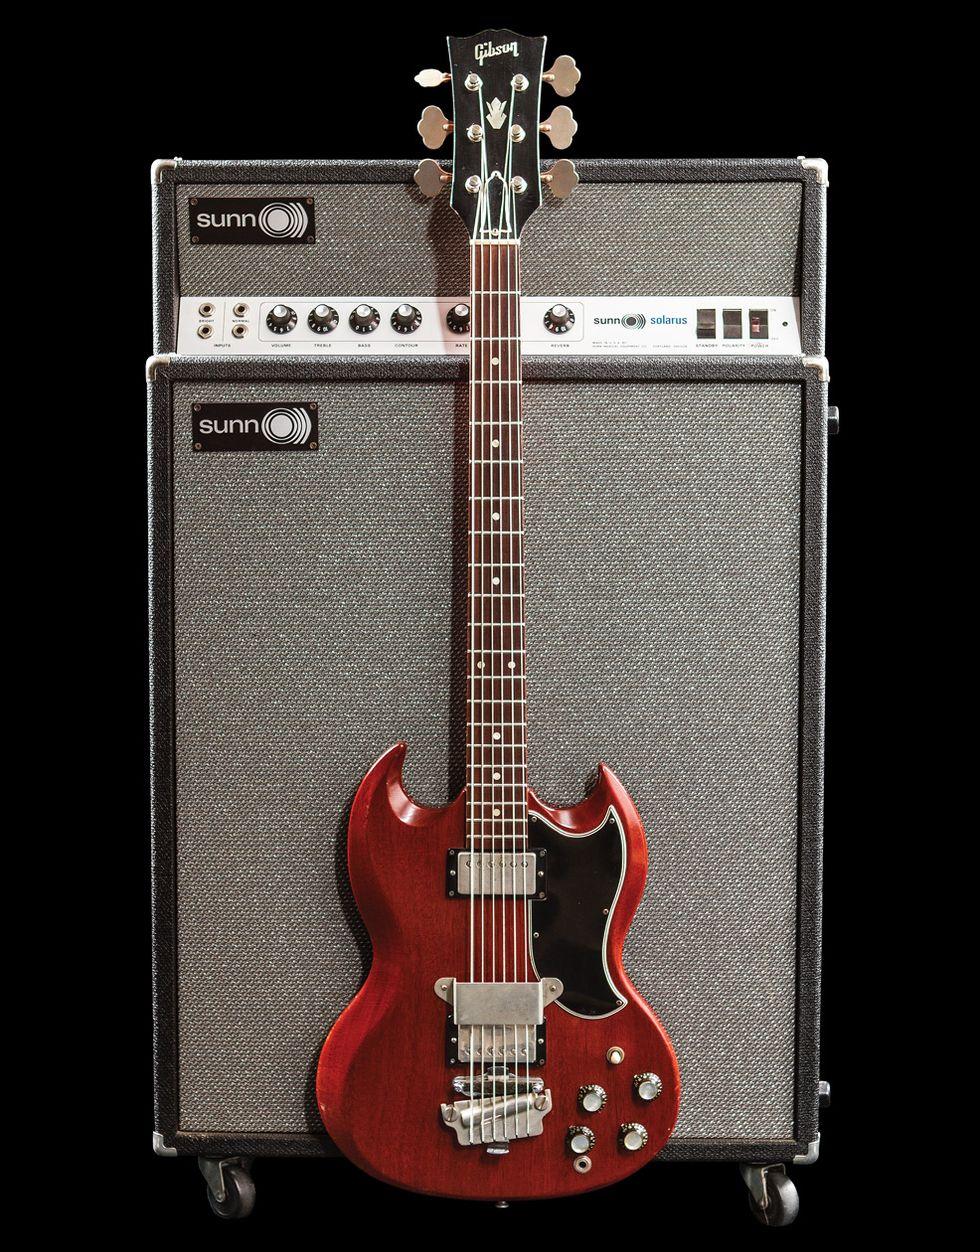 Spotlighting a Rare Gibson 6-String Bass homepage